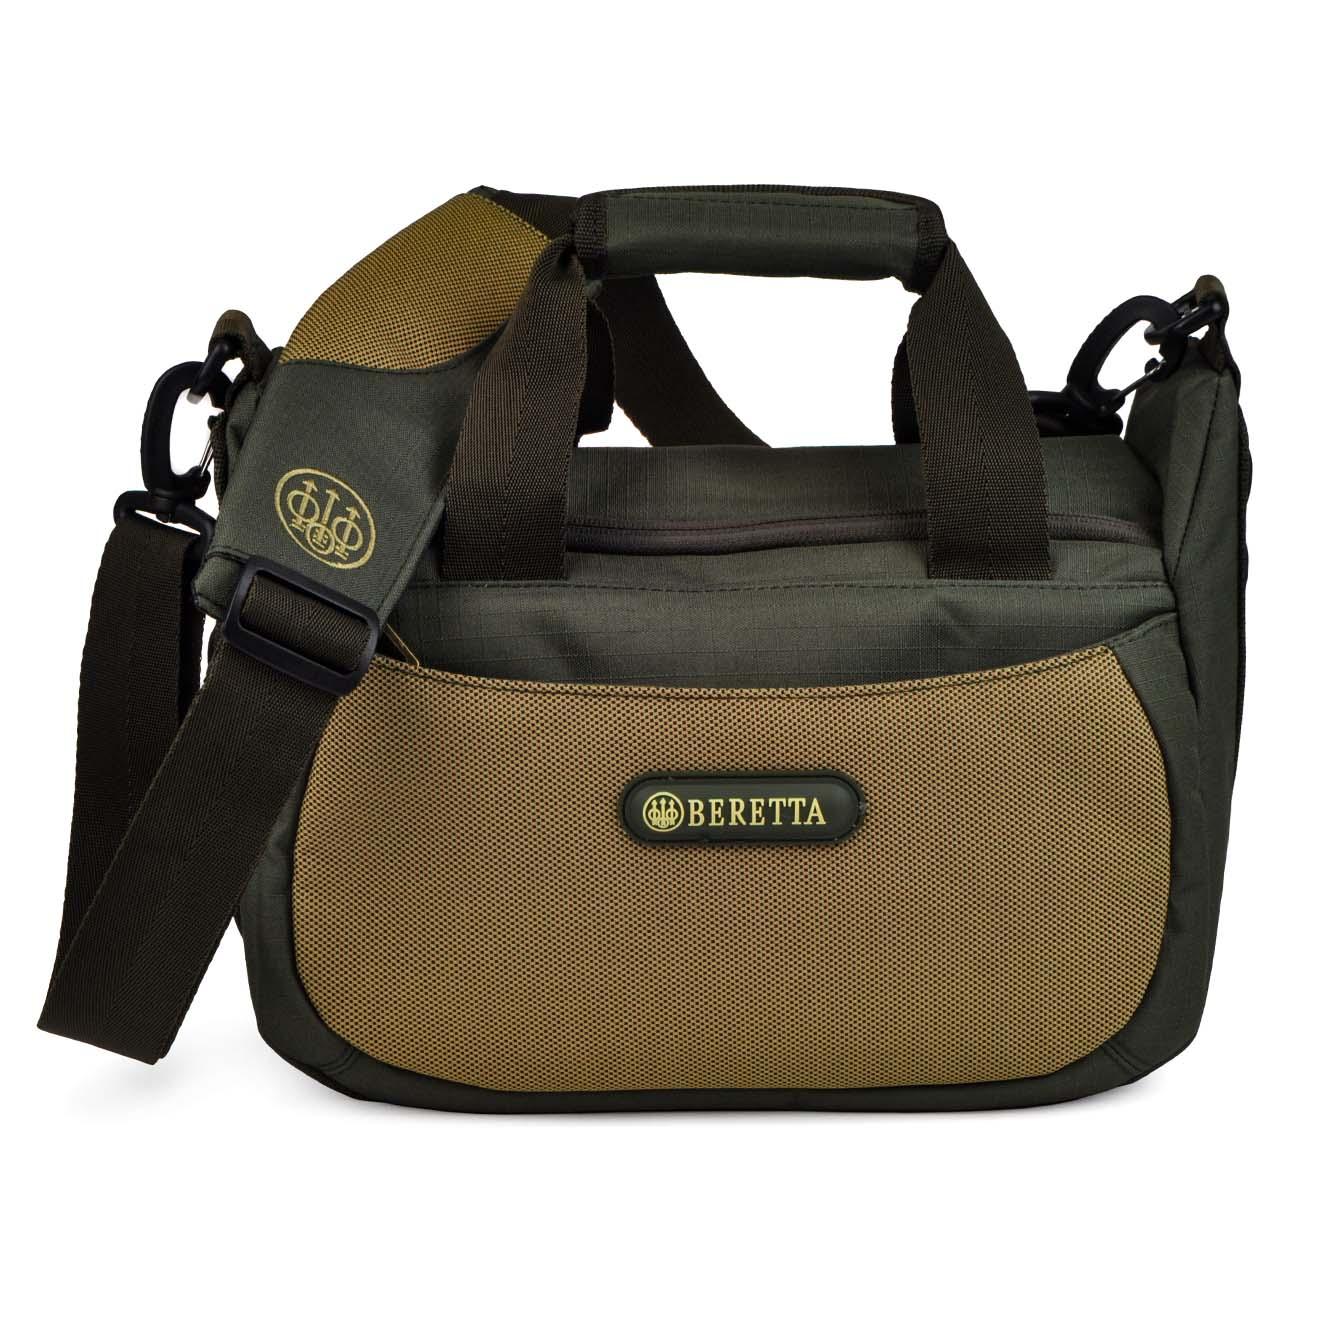 beretta retriever 100 cartridge bag green light brown